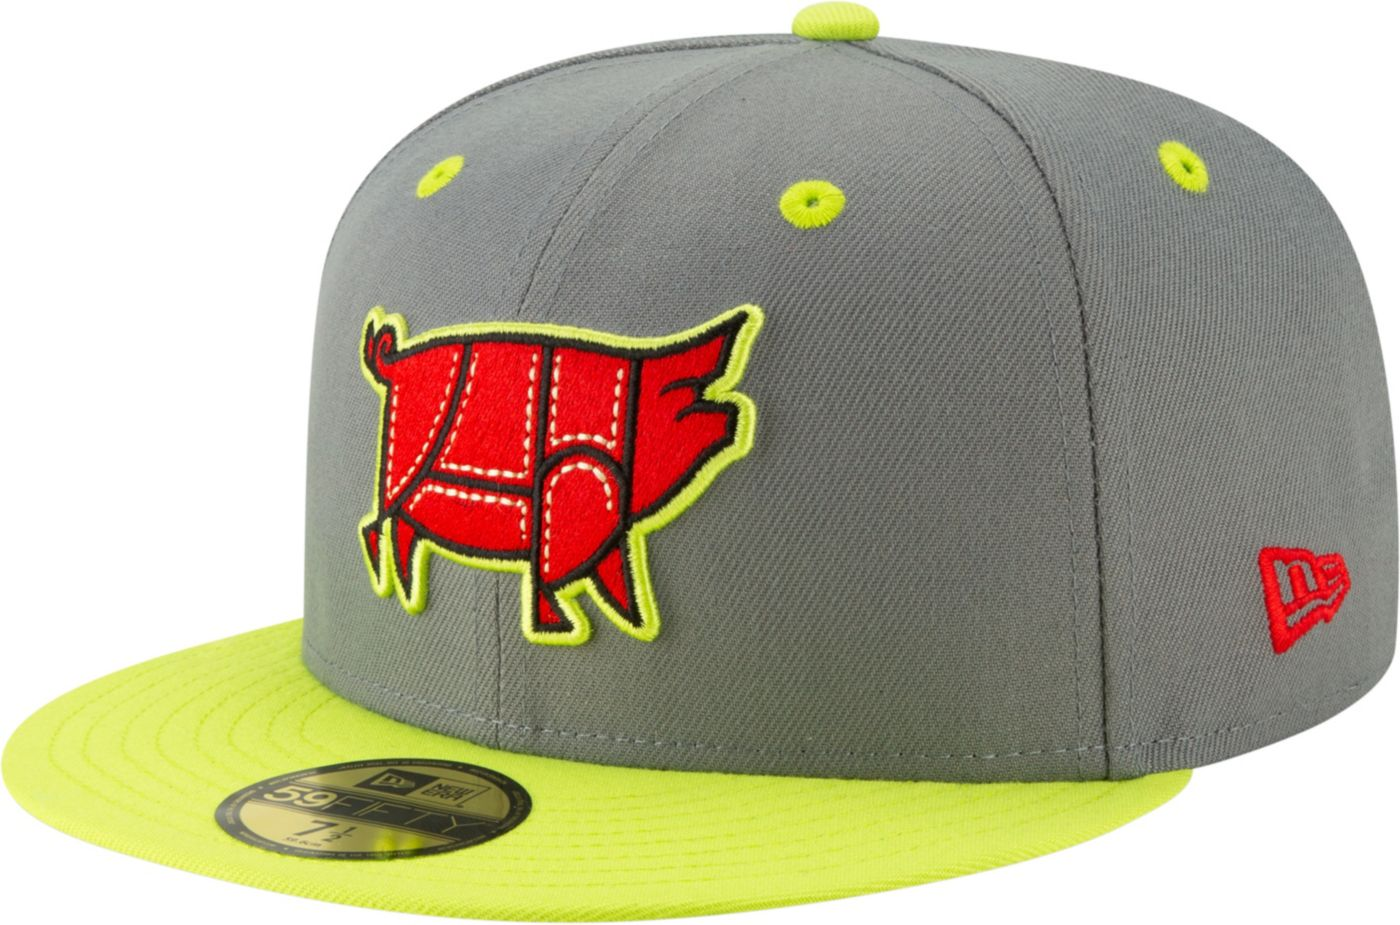 New Era Men's Columbia Fireflies 59Fifty 2019 COPA Authentic Hat